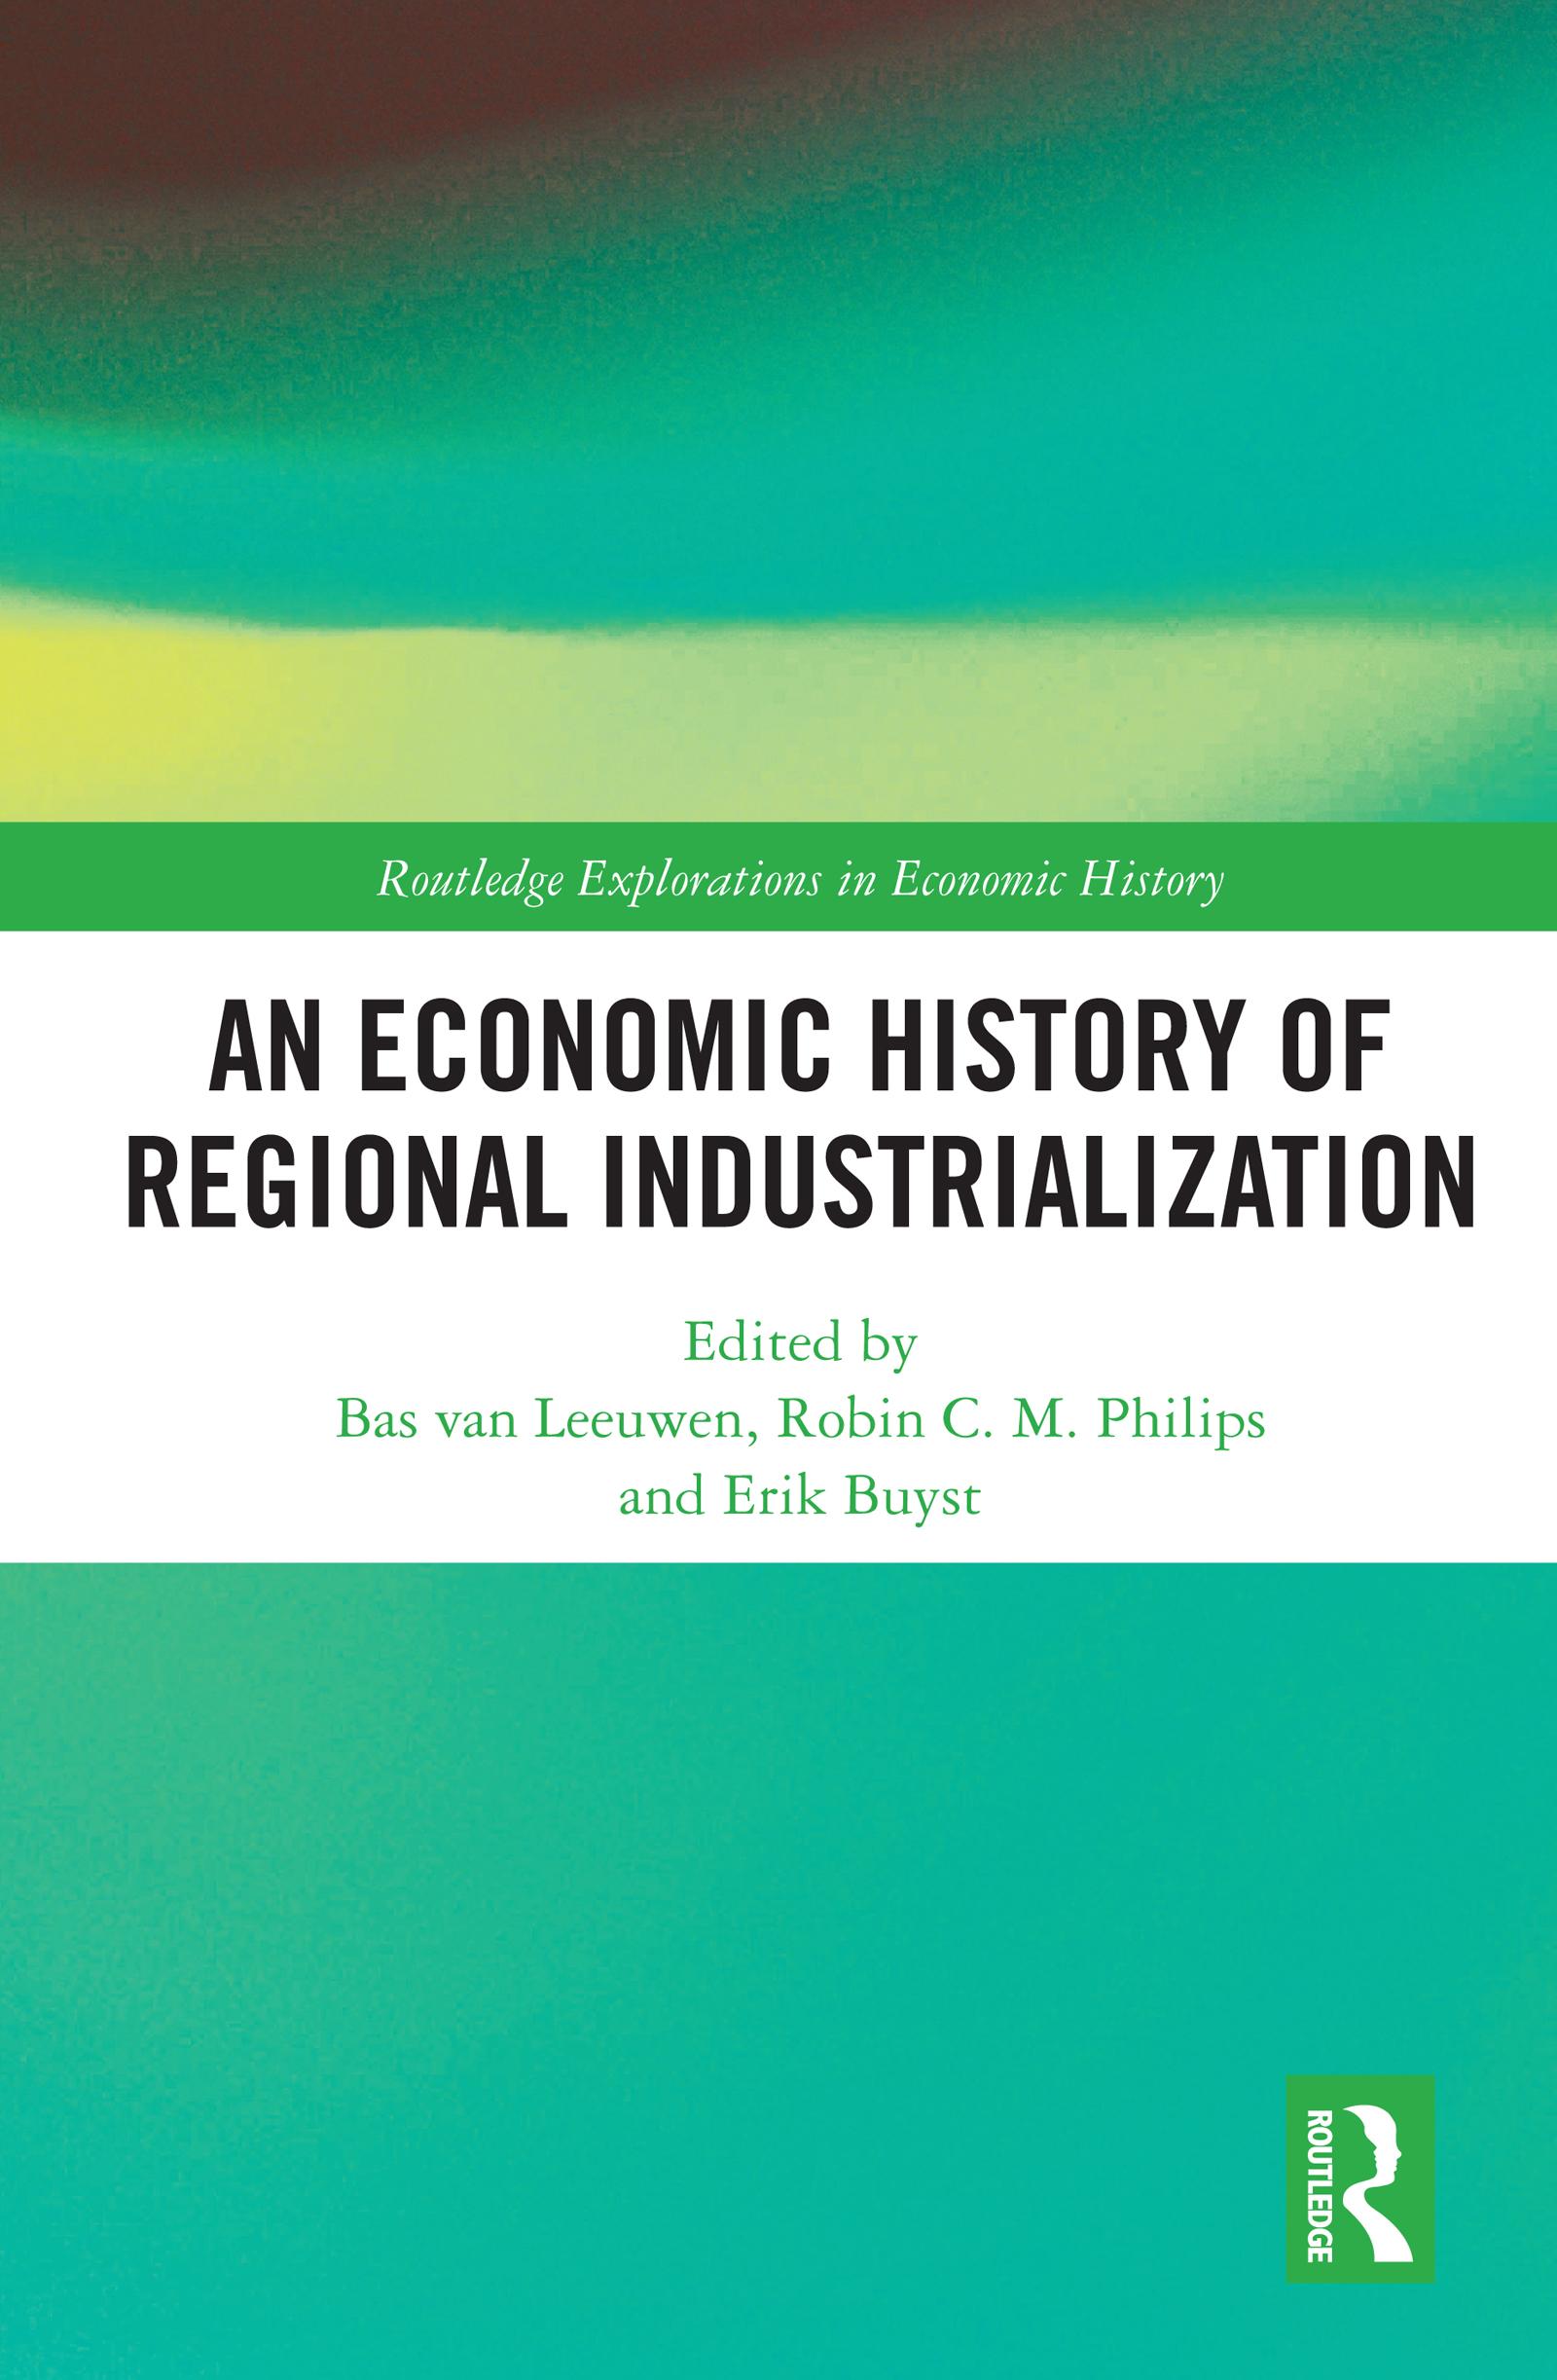 An Economic History of Regional Industrialization